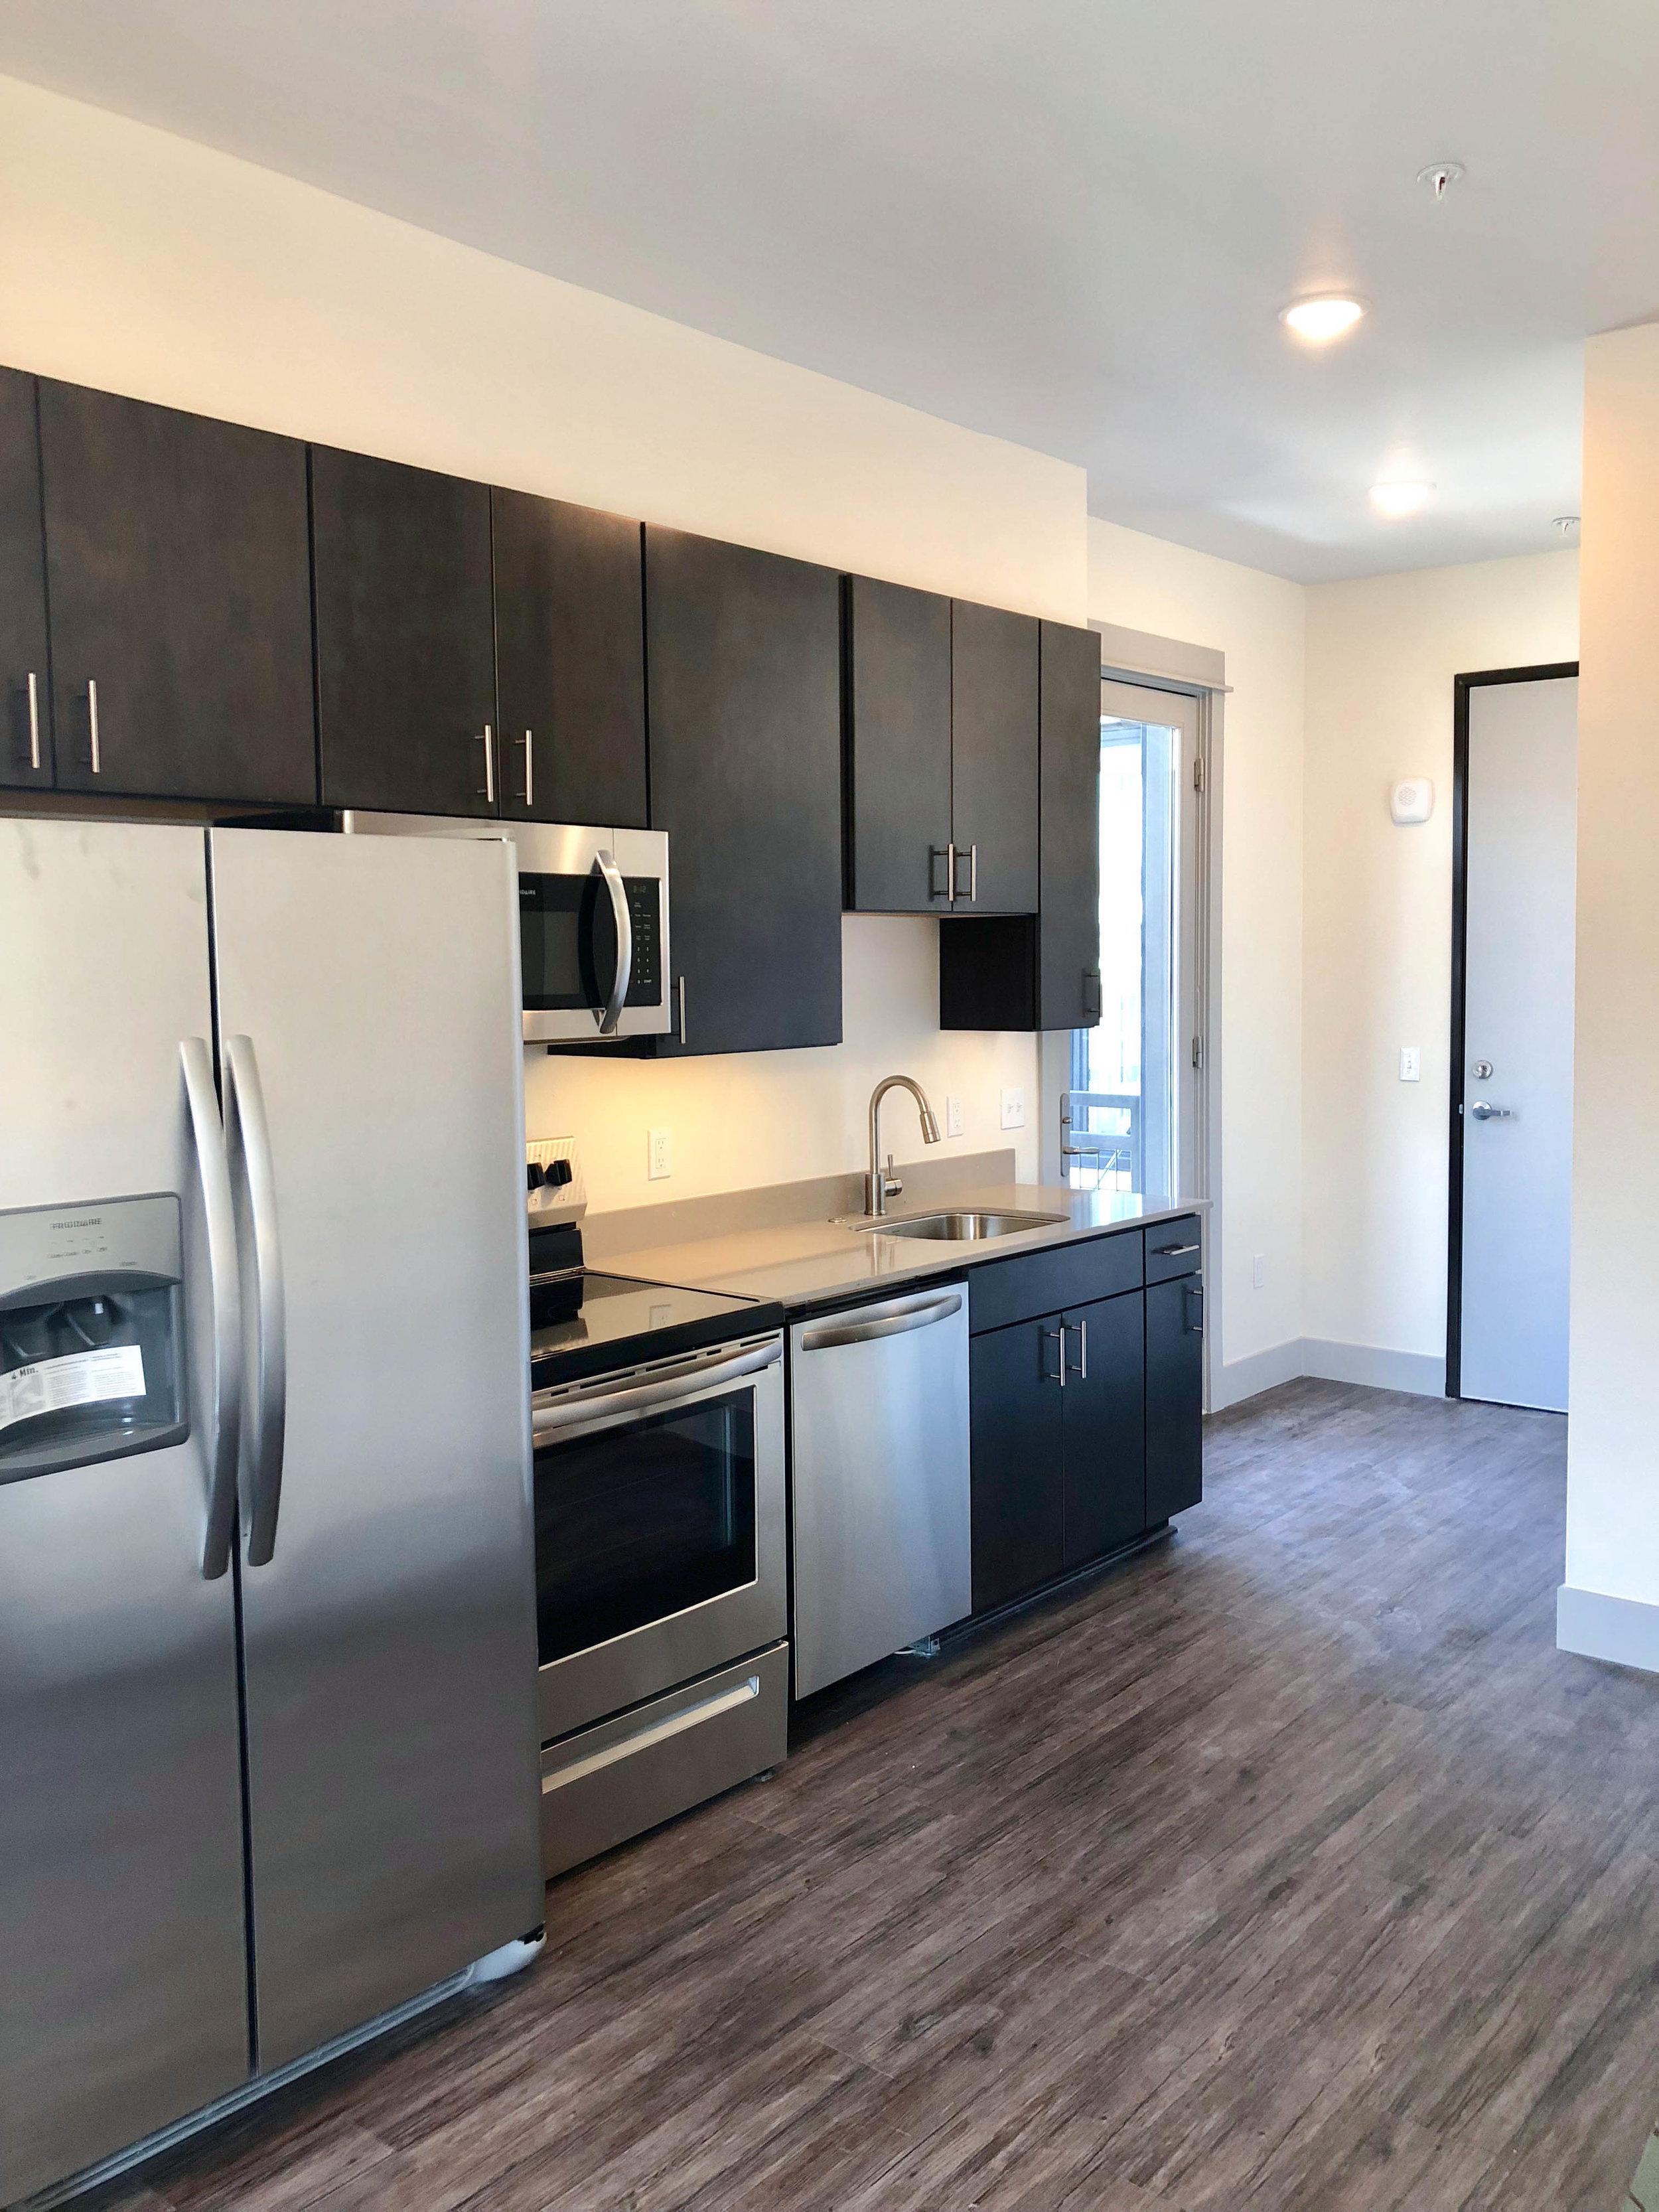 Everett - One Bedroom Kitchen